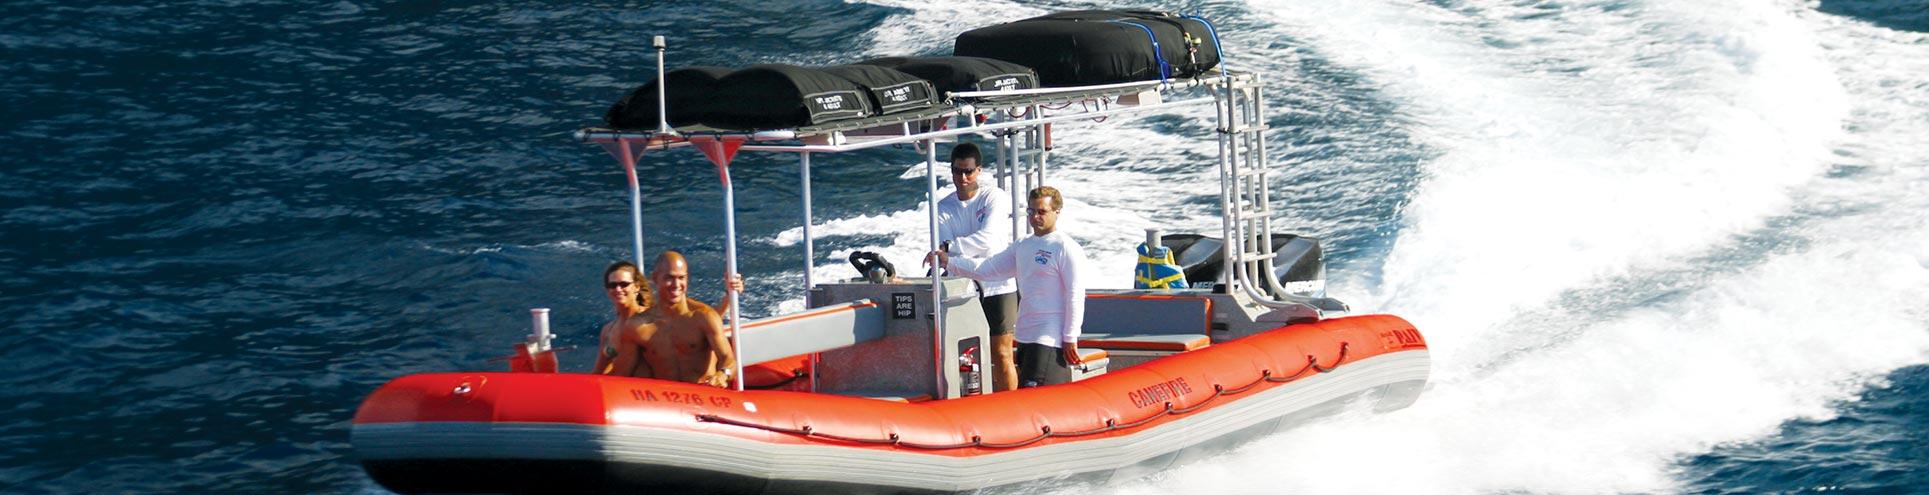 High Speed Superfun Rafts